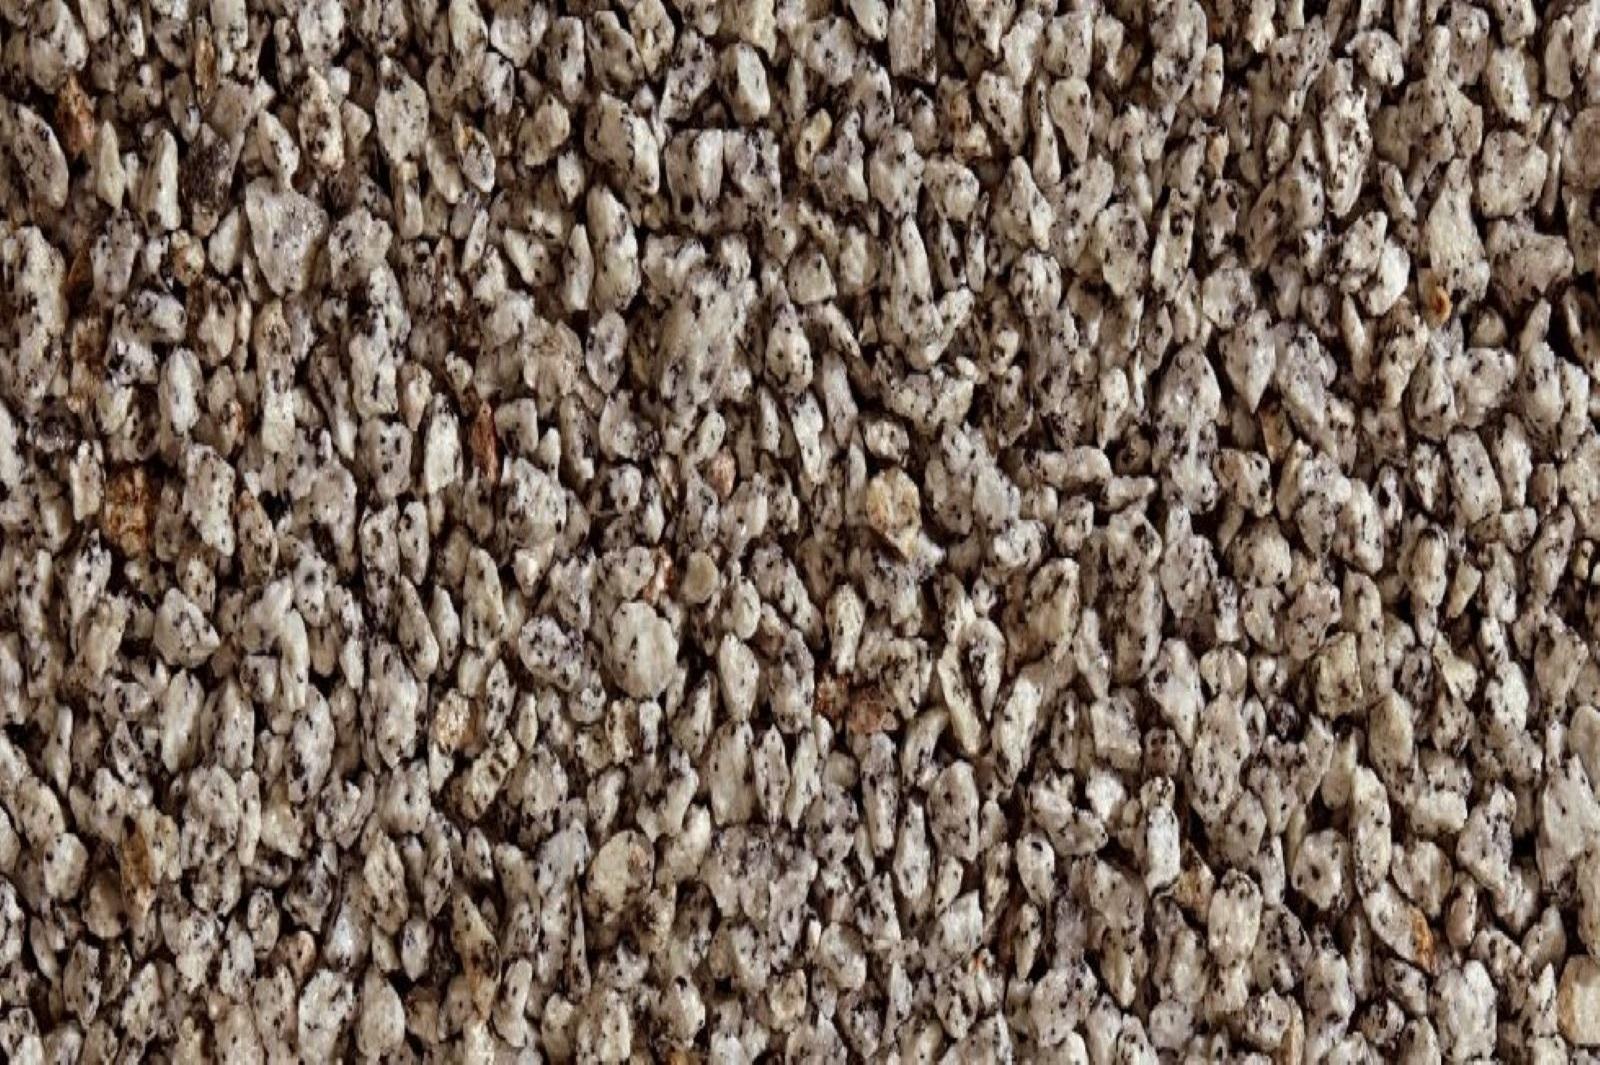 Gartensplitt Ziersplitt Granulat Granit weiß-schwarz gesprenkelt 10-16 mm 25 kg